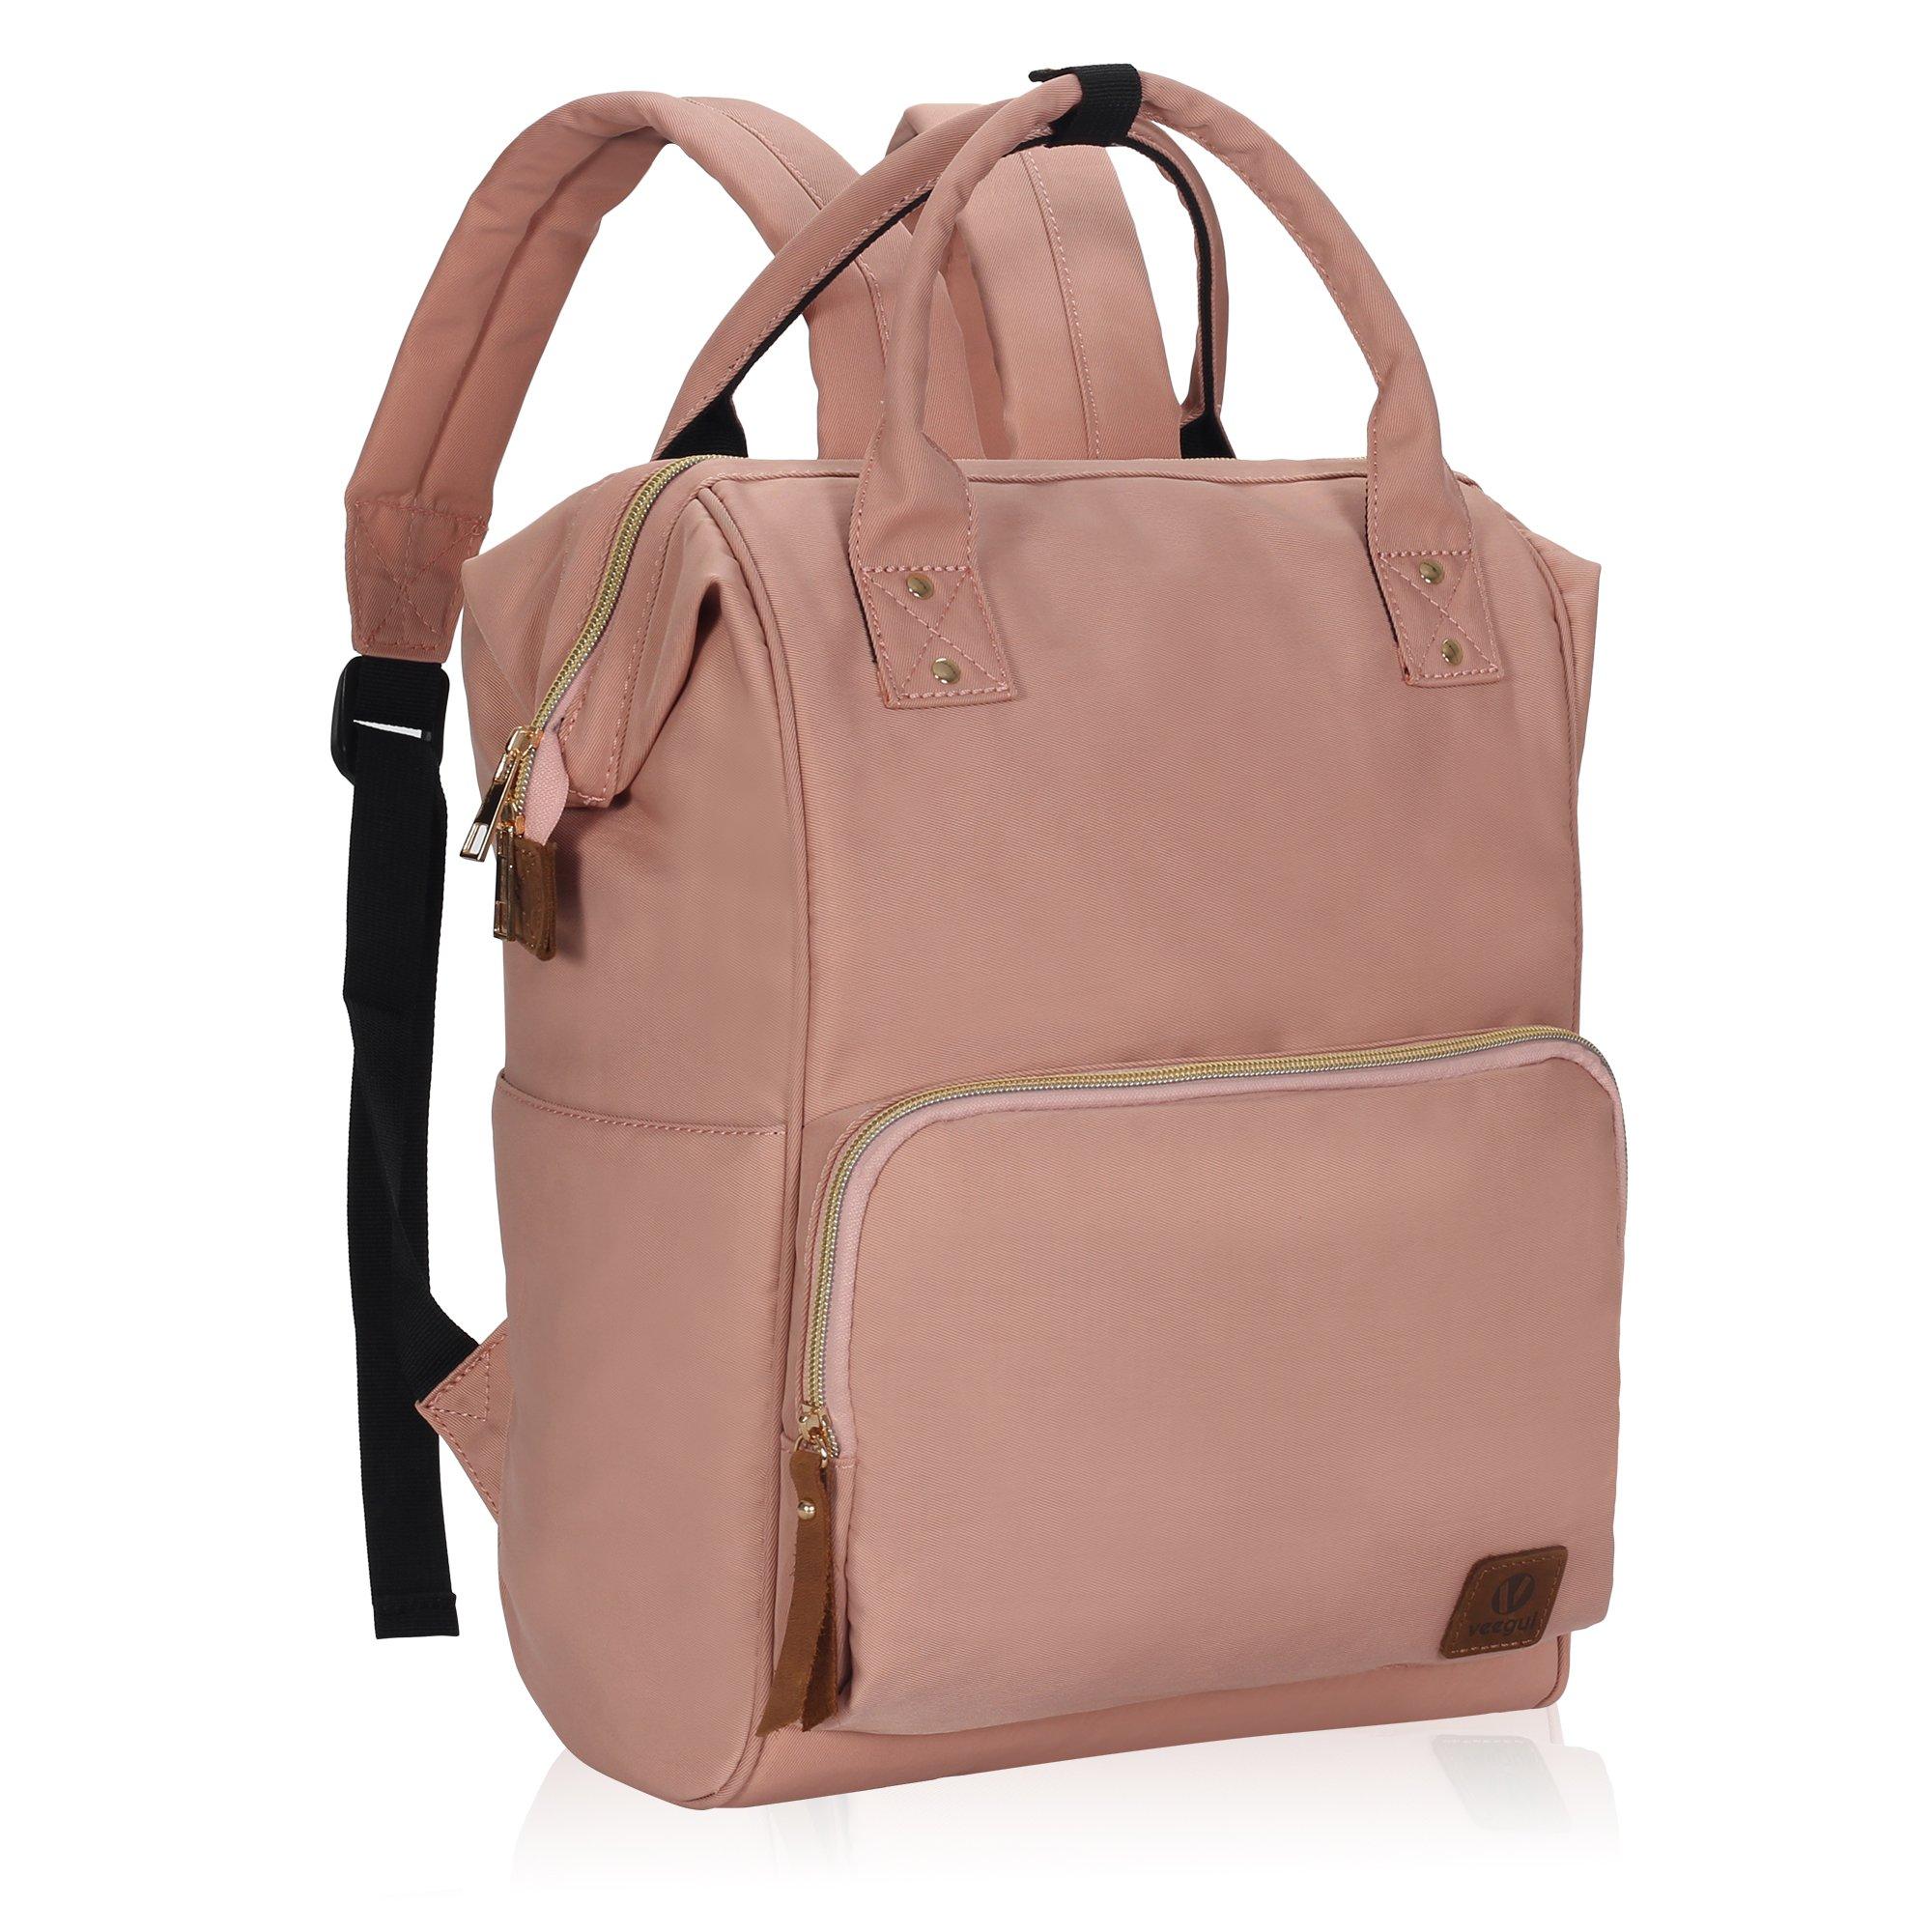 Veegul Wide Open Multipurpose School Backpack Lightweight Travel Bag 18L Light Pink by Hynes Eagle